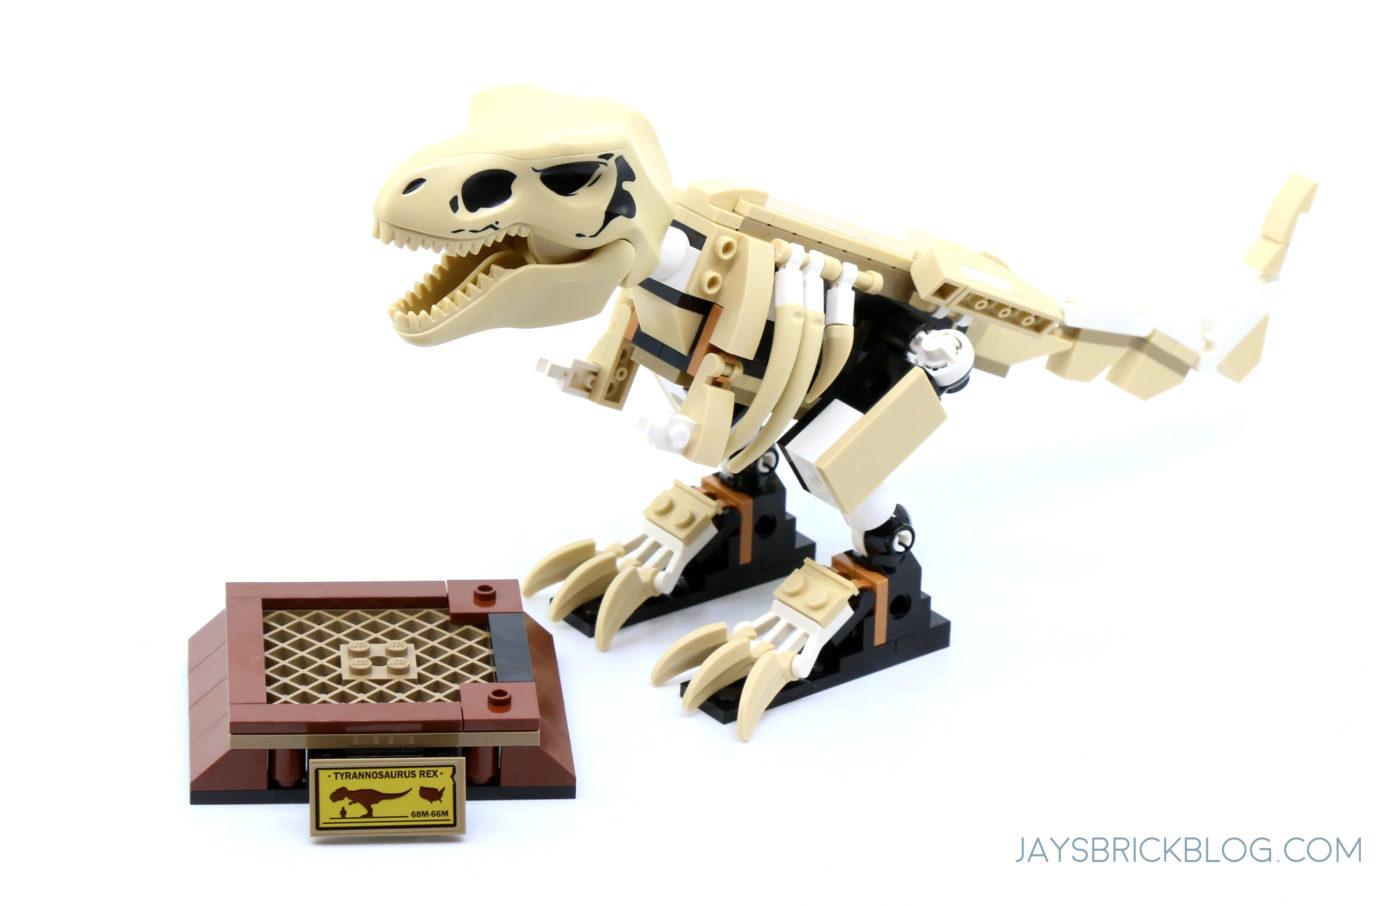 LEGO 76940 T. rex Dinosaur Fossil Exhibition Stand